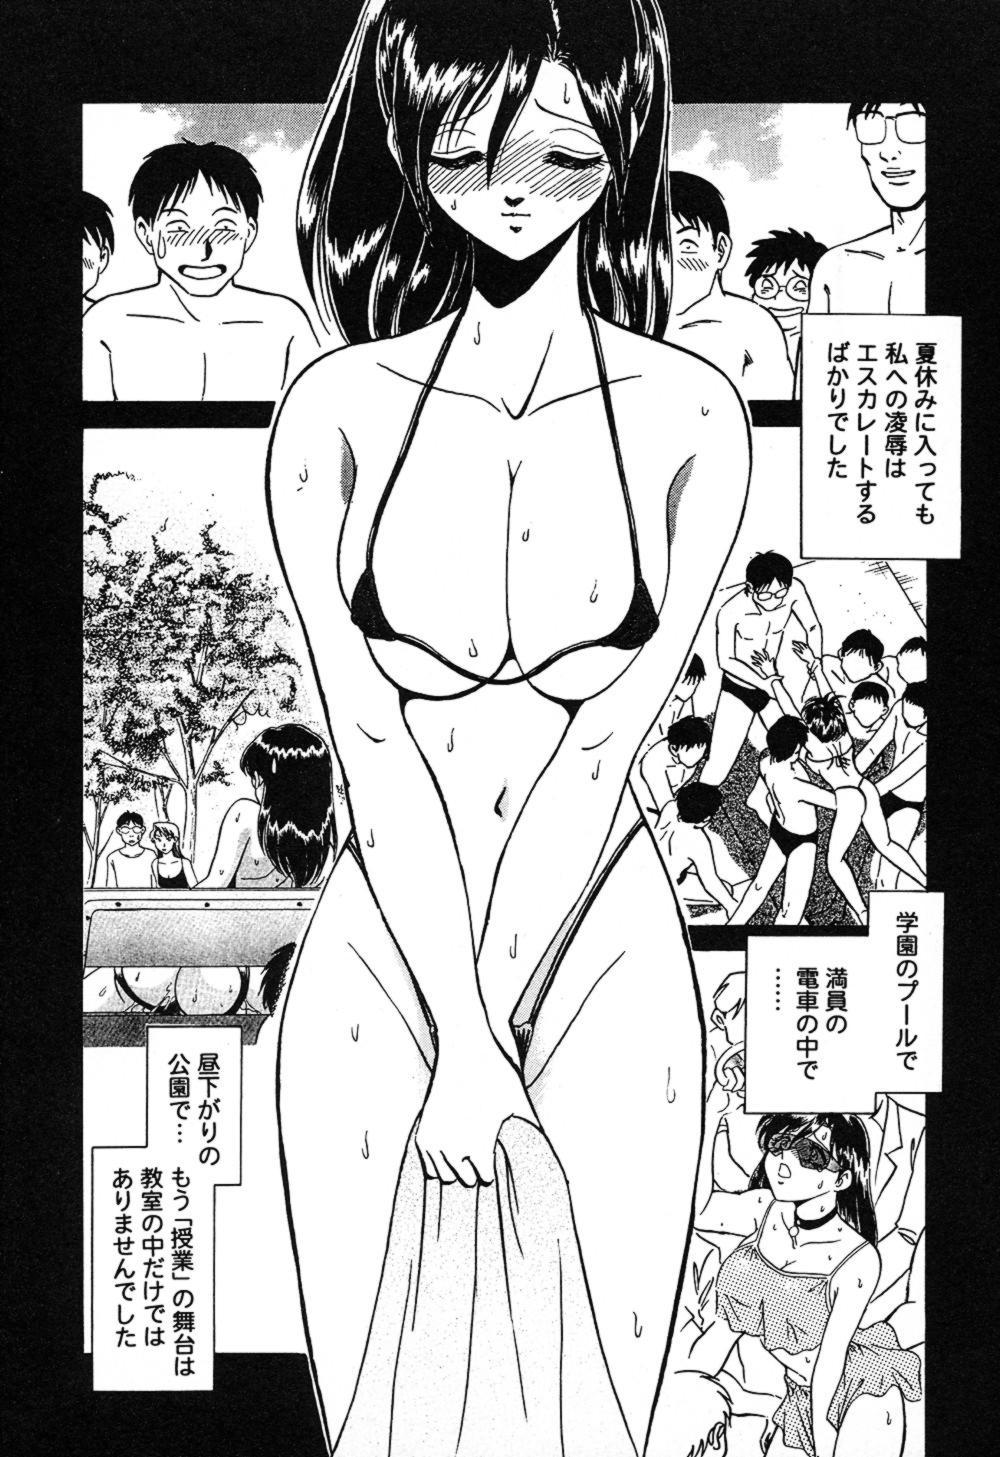 Hageshii Kagai Jugyou 12